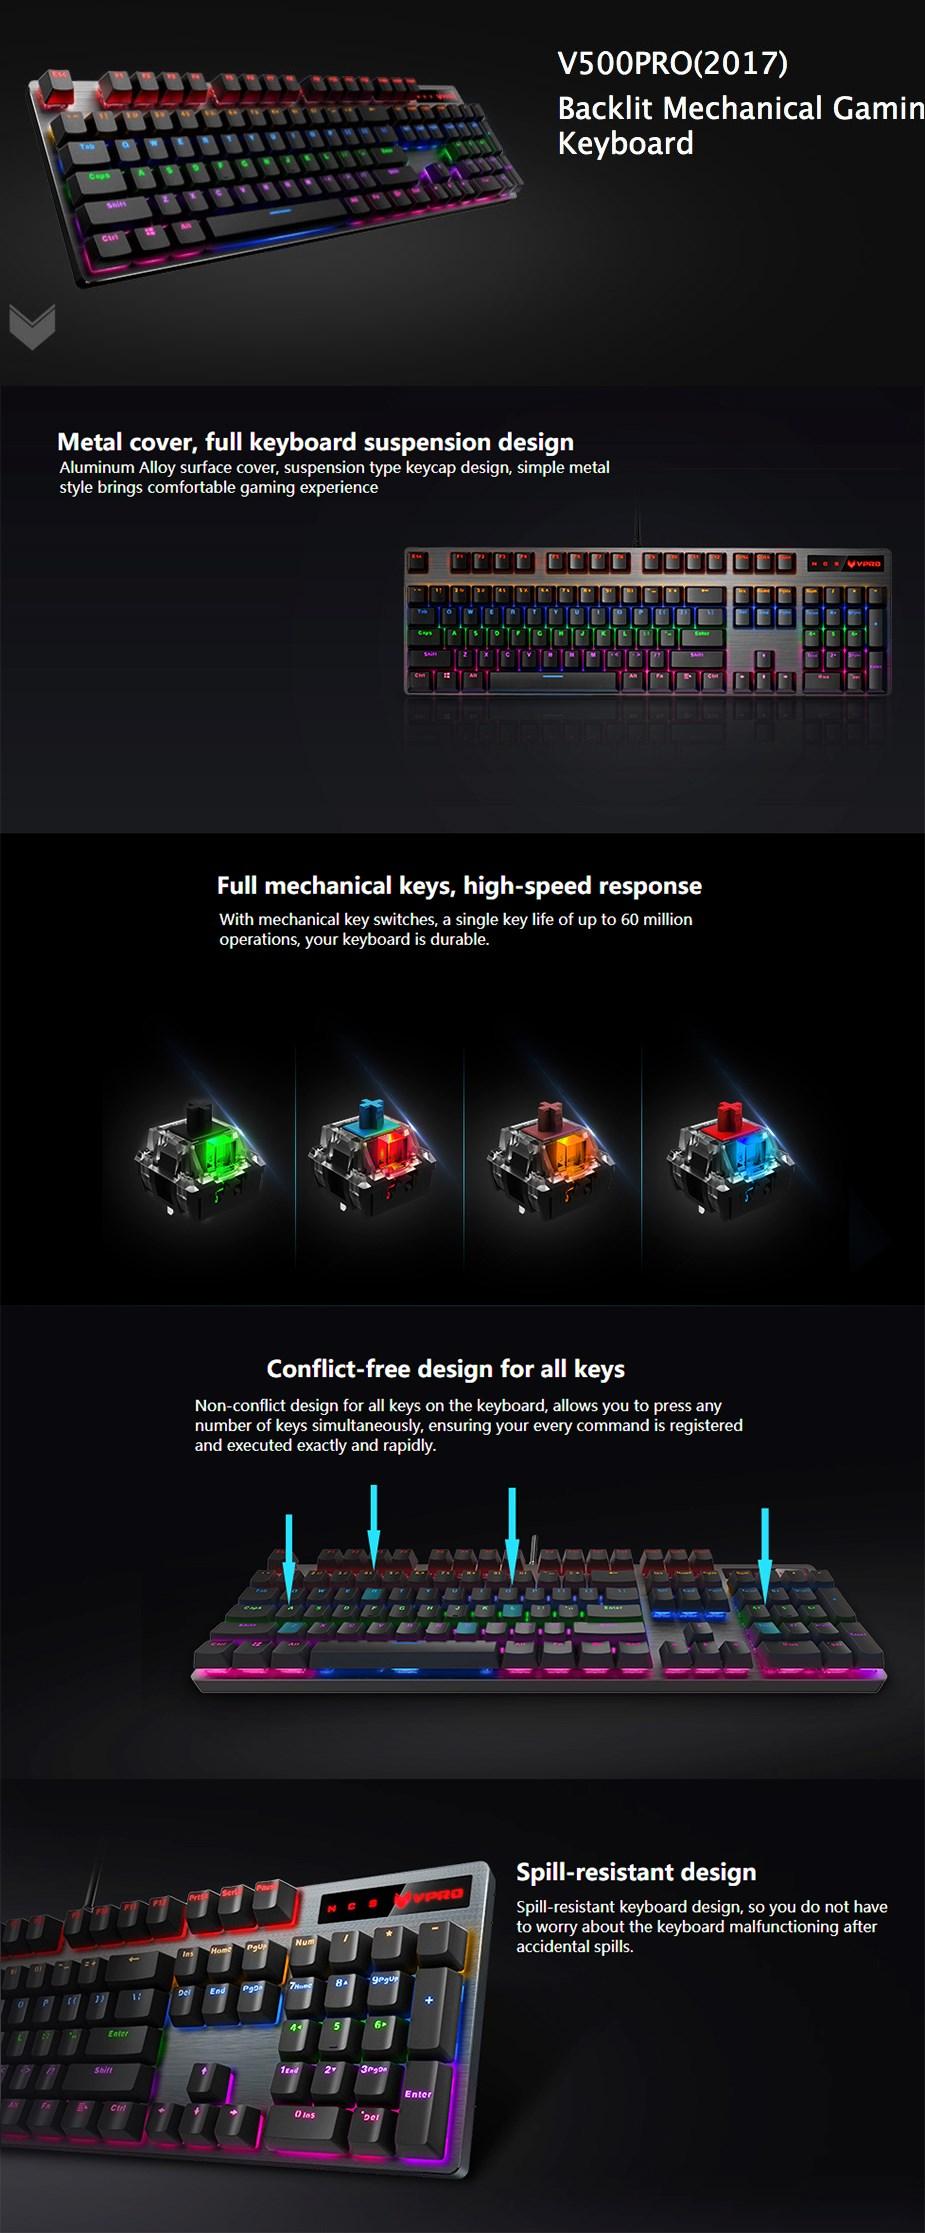 Rapoo V500proBacklit Mechanical Gaming Keyboard - Blue Switch - Overview 1